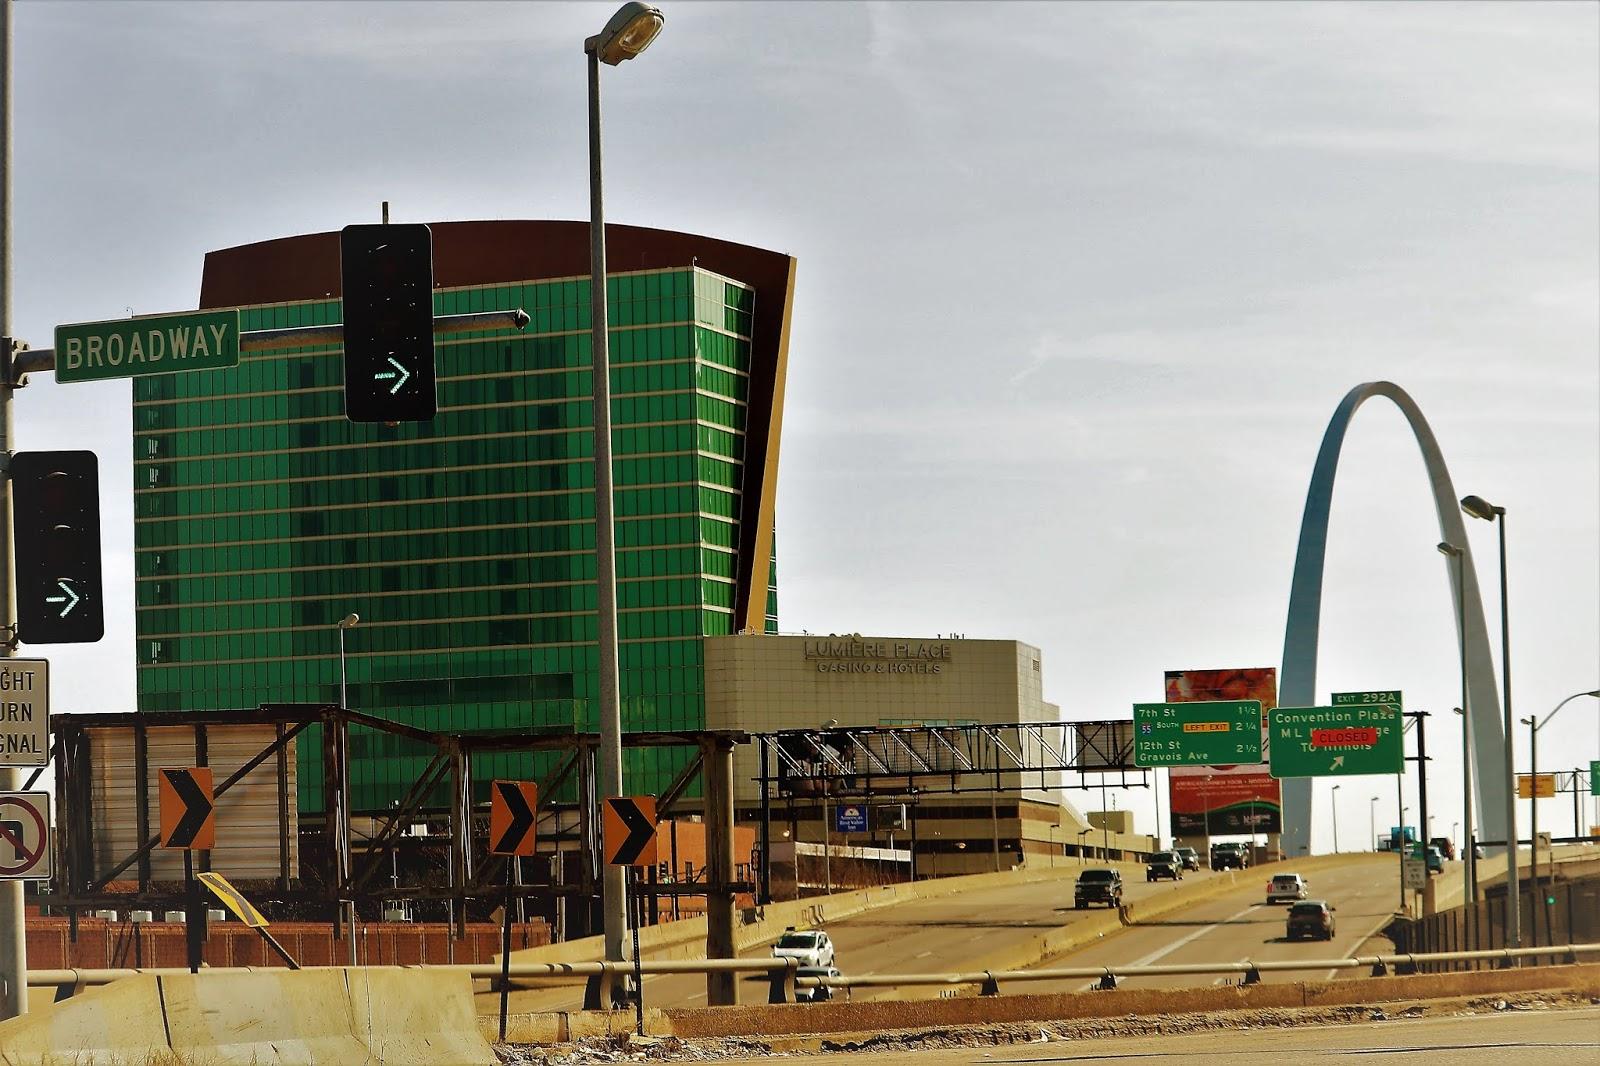 Lumiere Place Casino